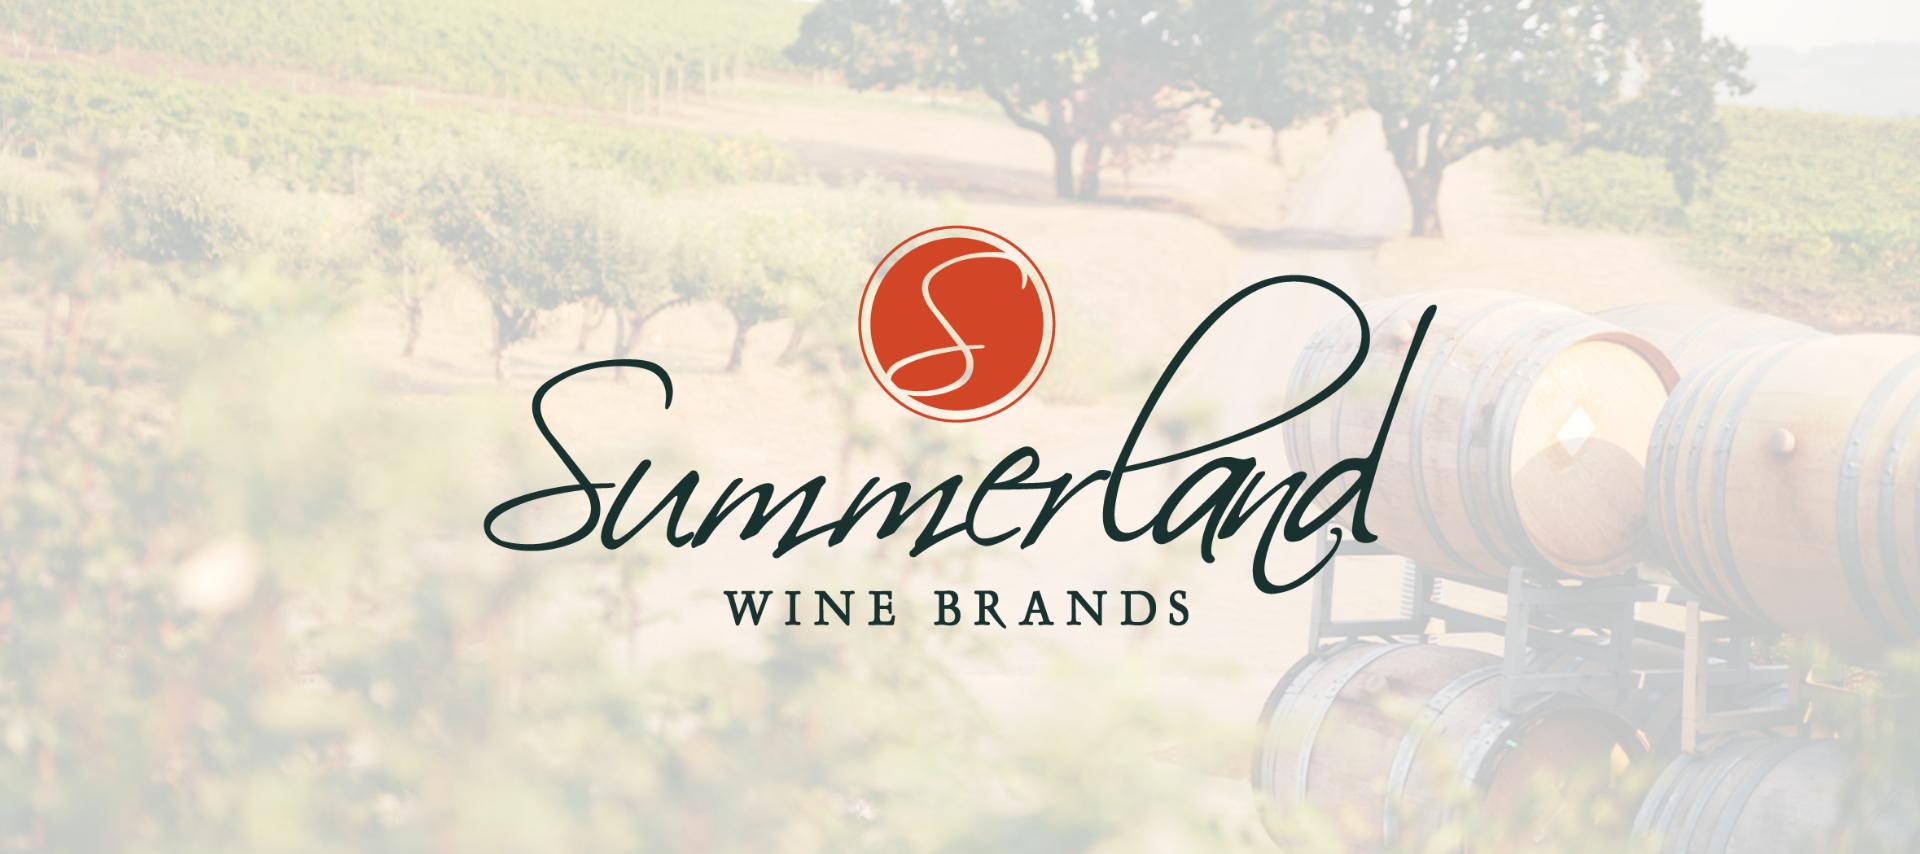 Terravant Wine Company logo